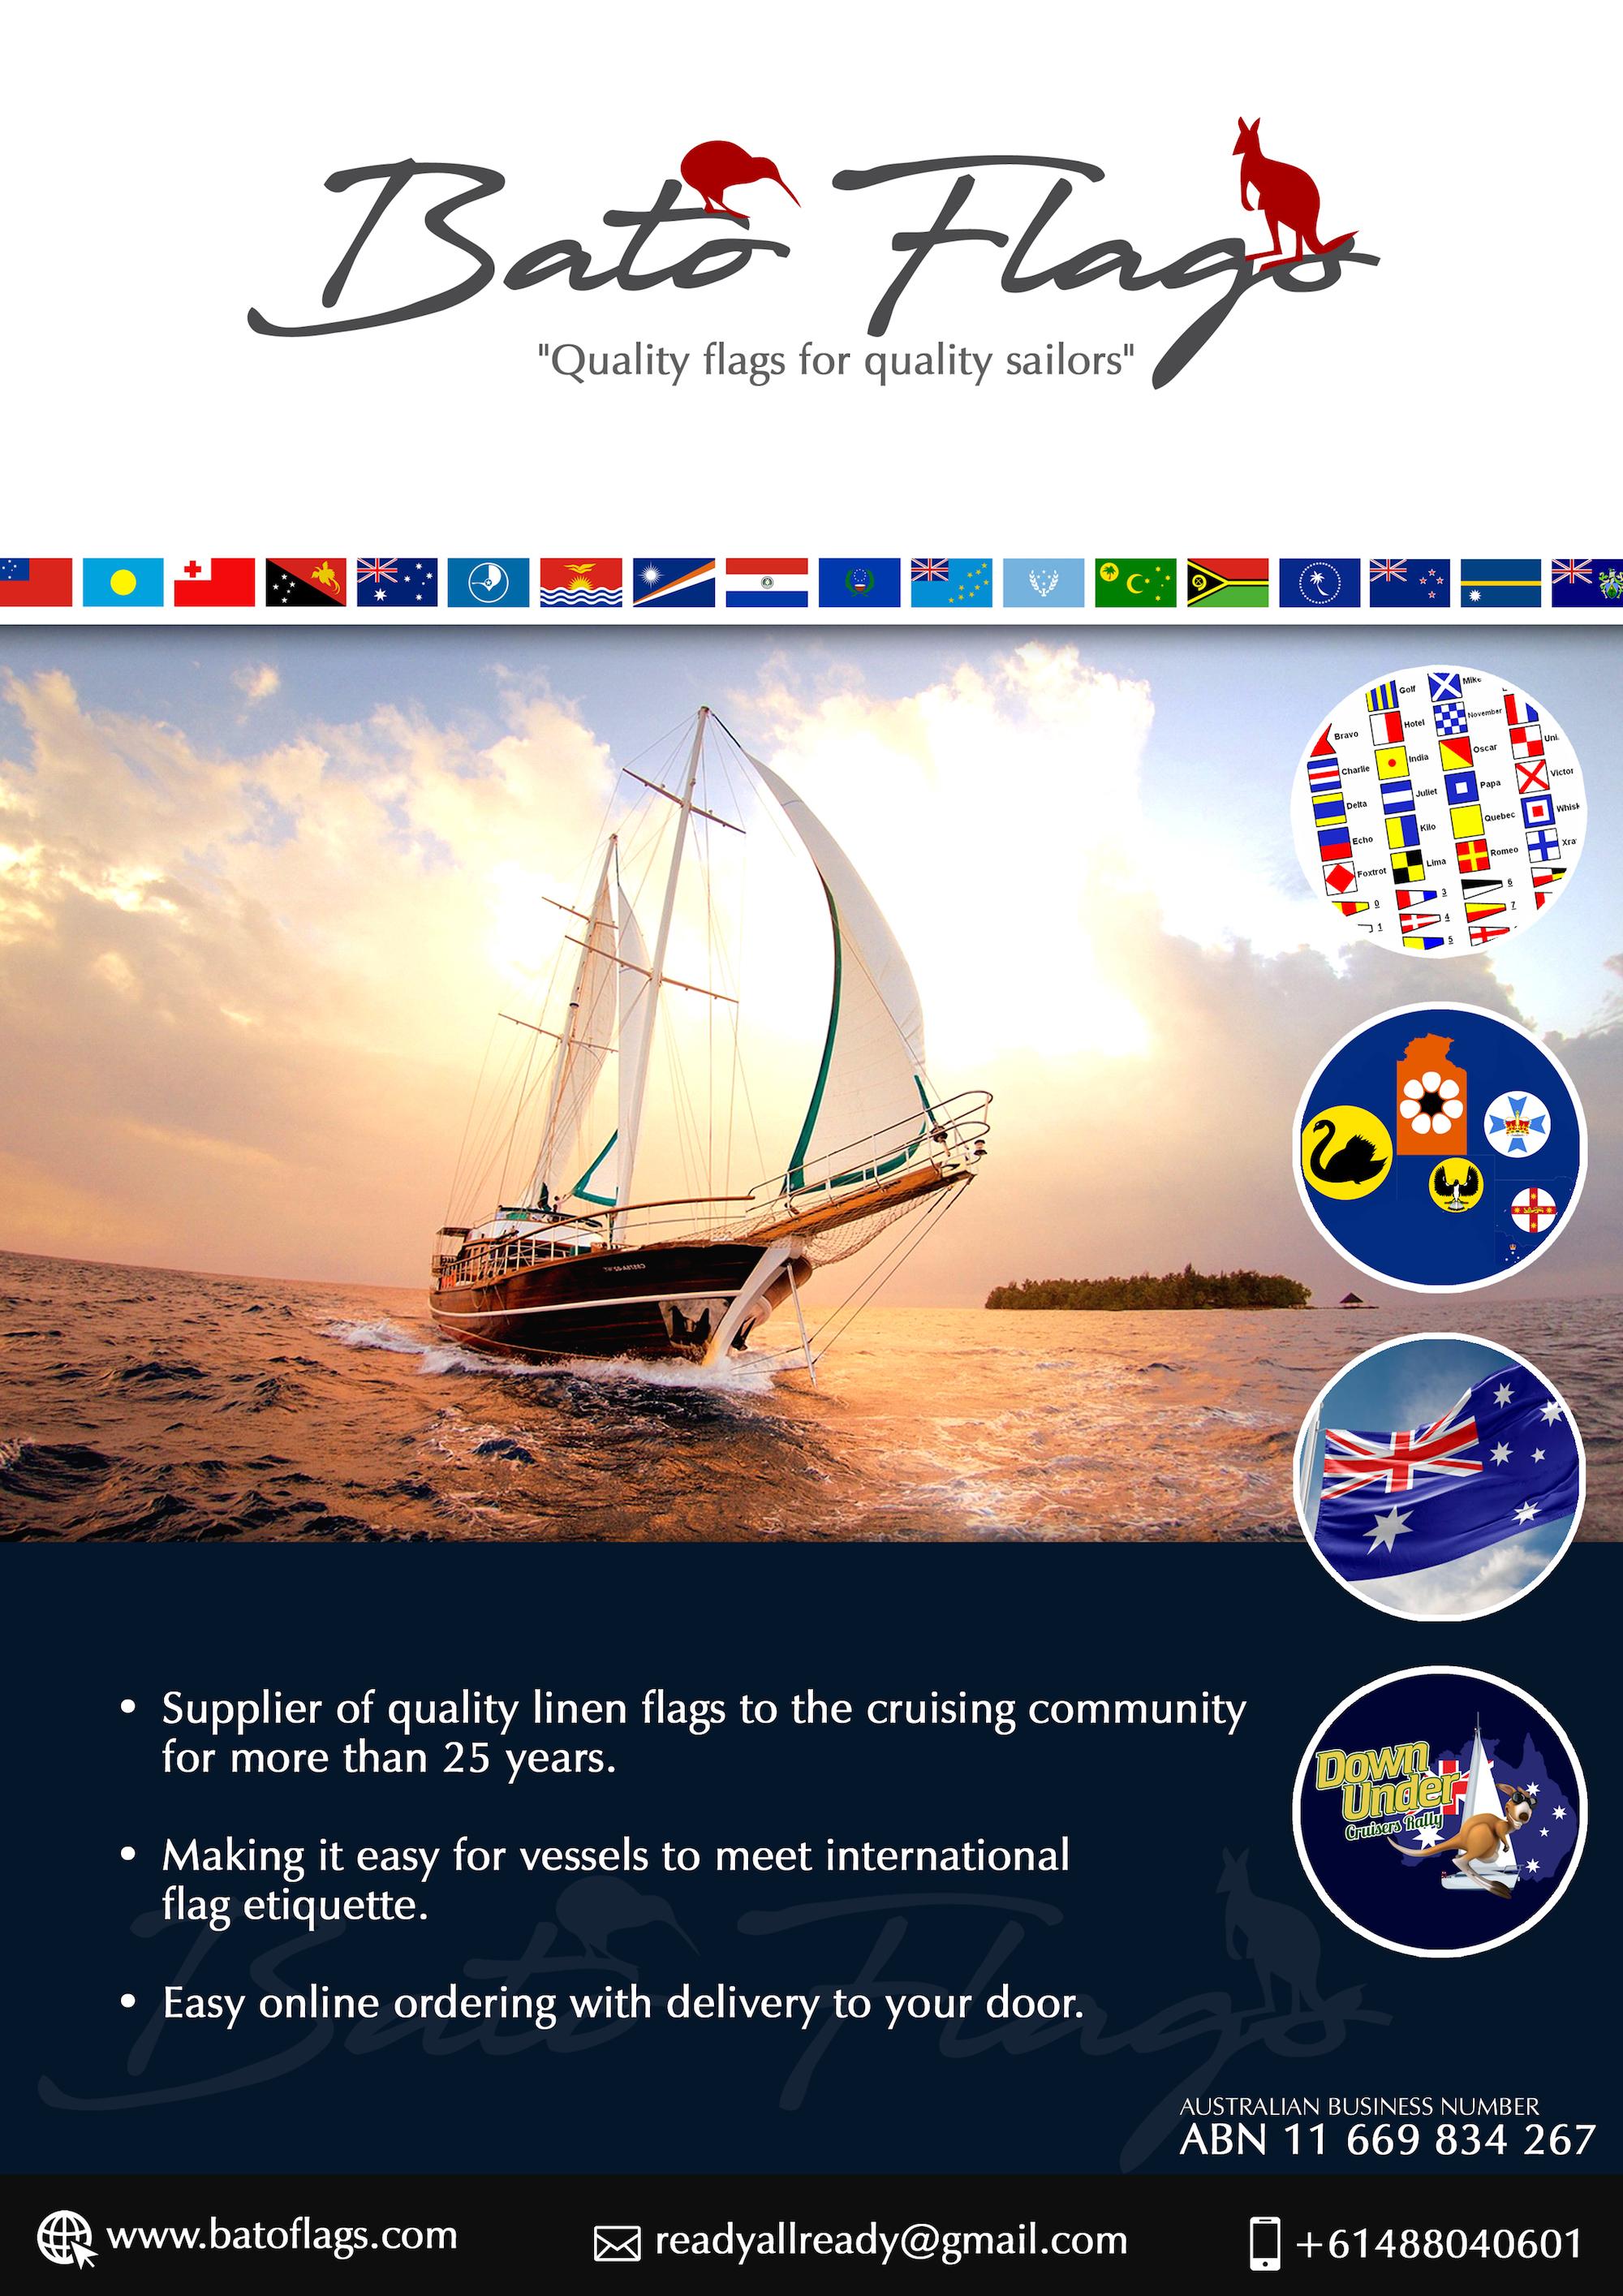 Bato Flags Australia